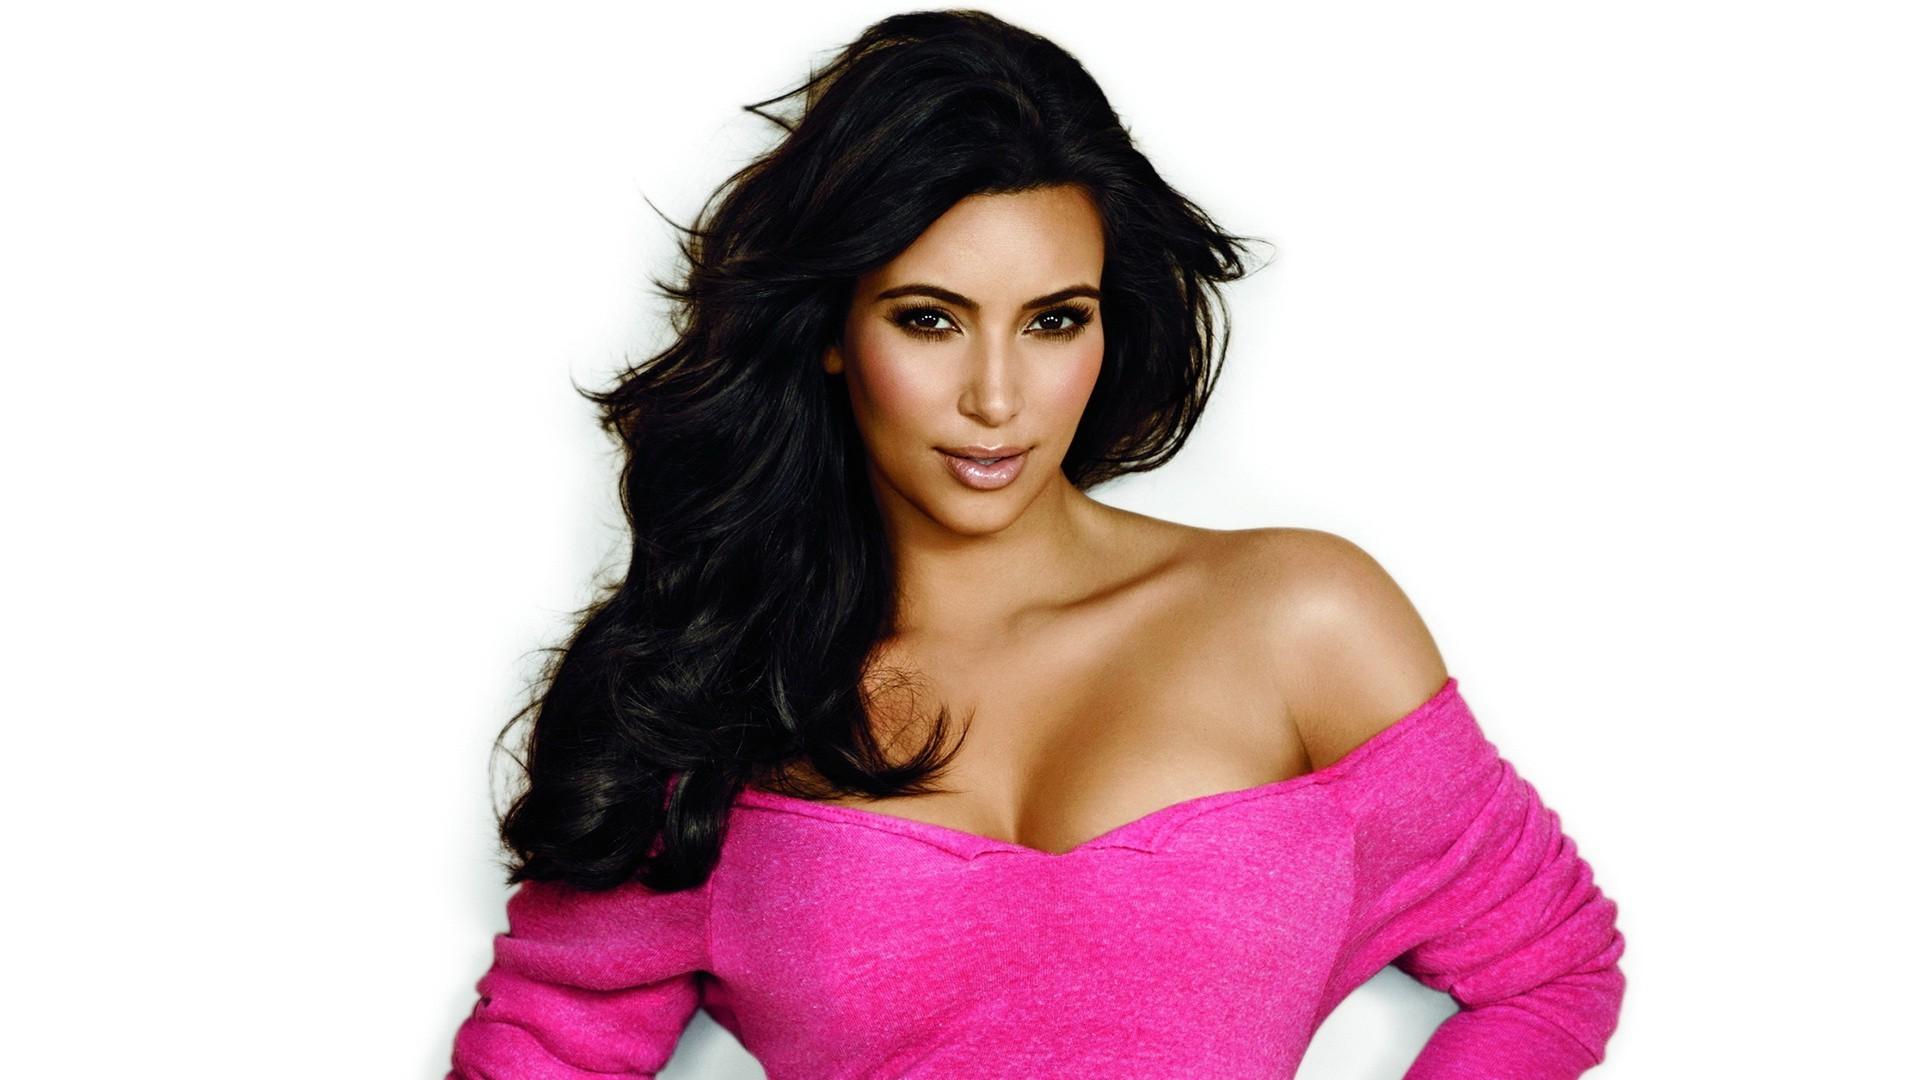 Kim Kardashian Wallpapers Pictures 1920x1080